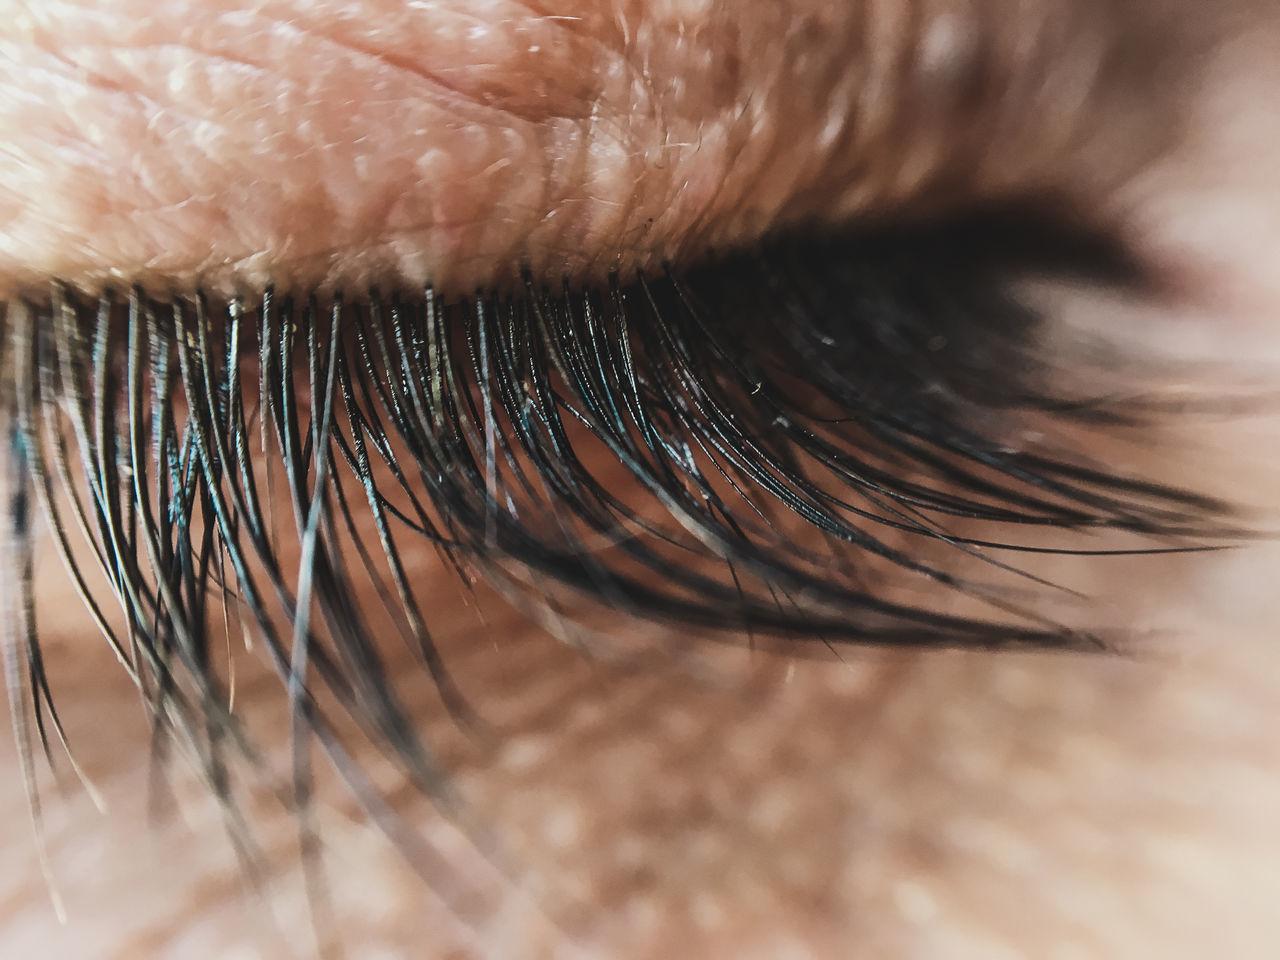 eyelash, selective focus, macro, close-up, sensory perception, human body part, full frame, eyesight, human eye, eyeball, indoors, real people, one person, day